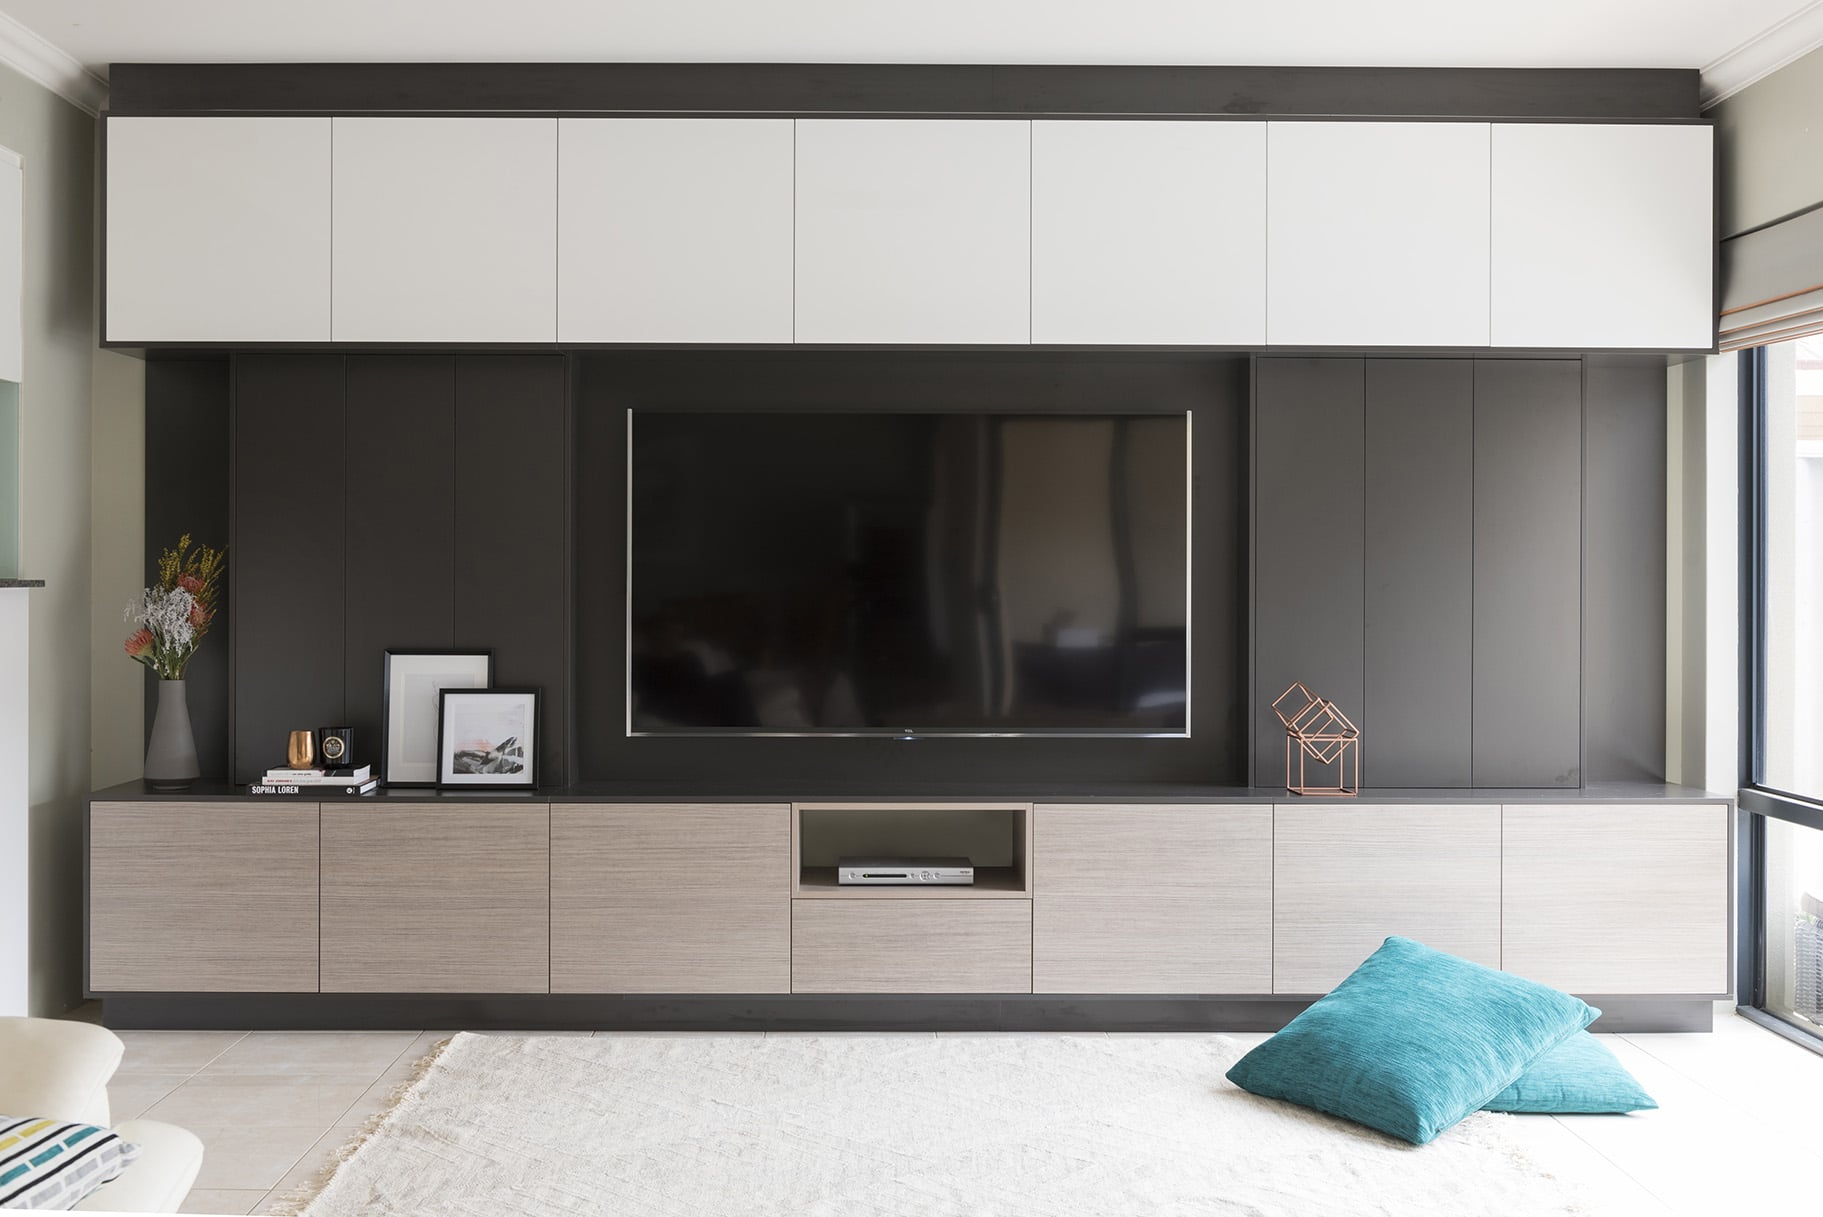 kitchen craftsmen kitchen renovation blog storage solutions living room